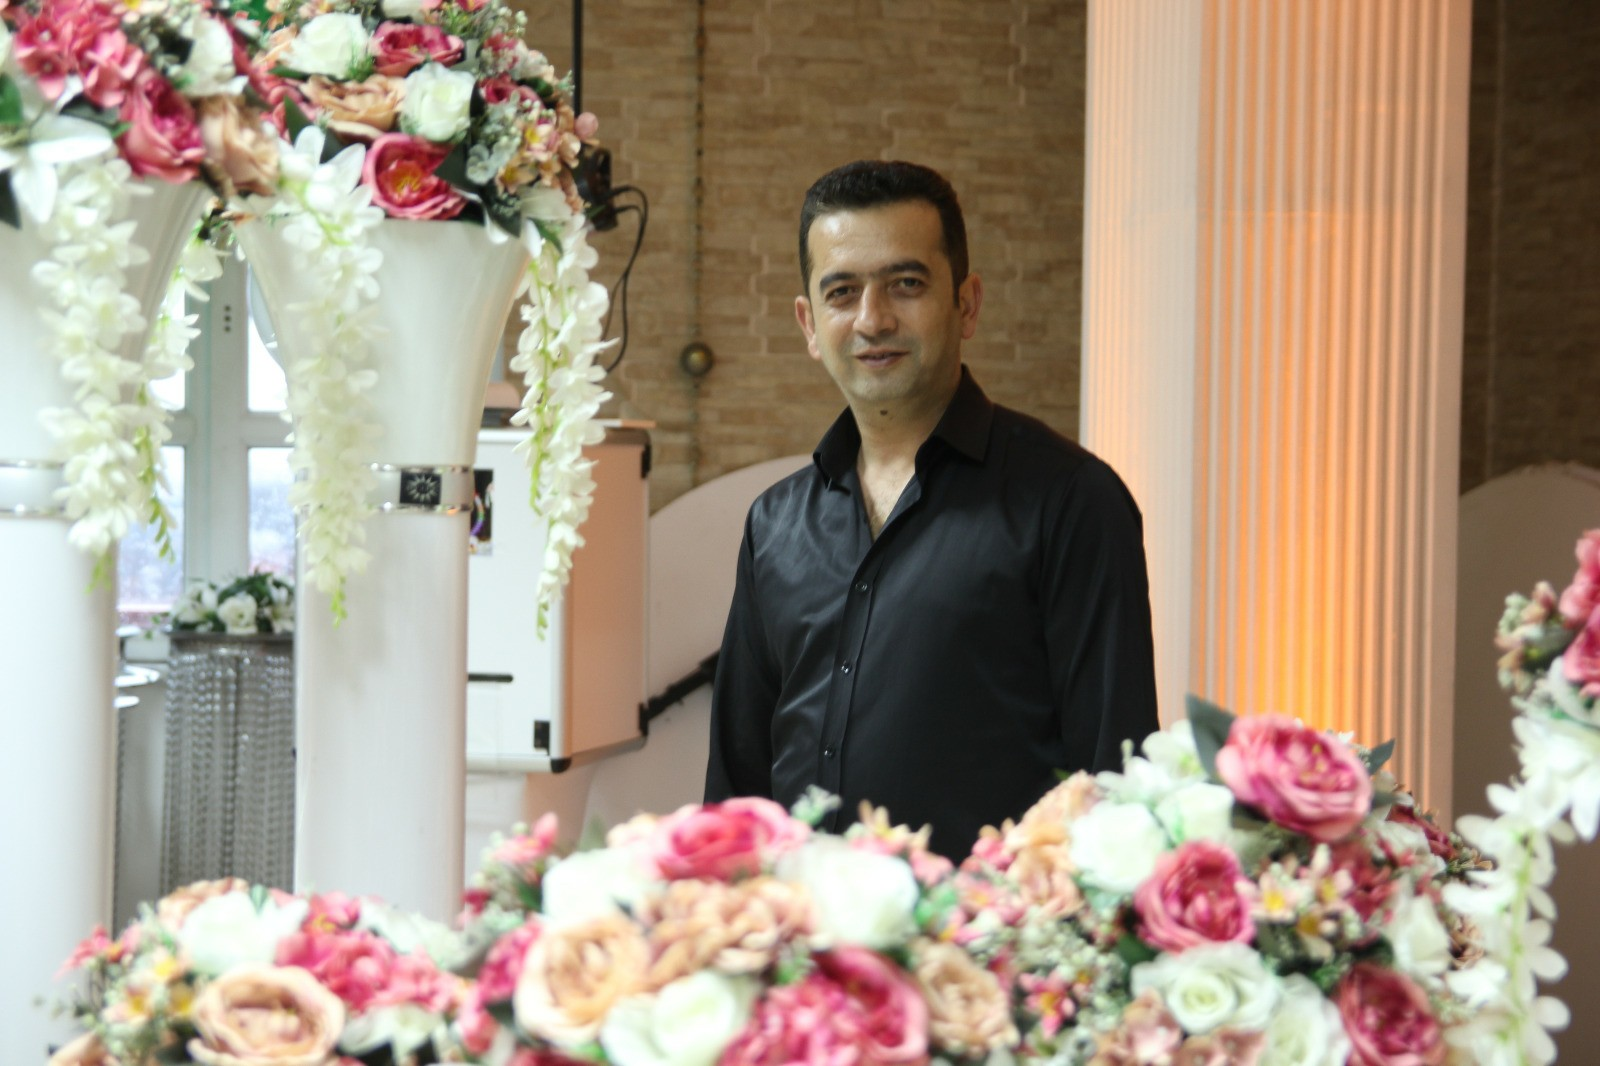 Mehmet Yerlikaya